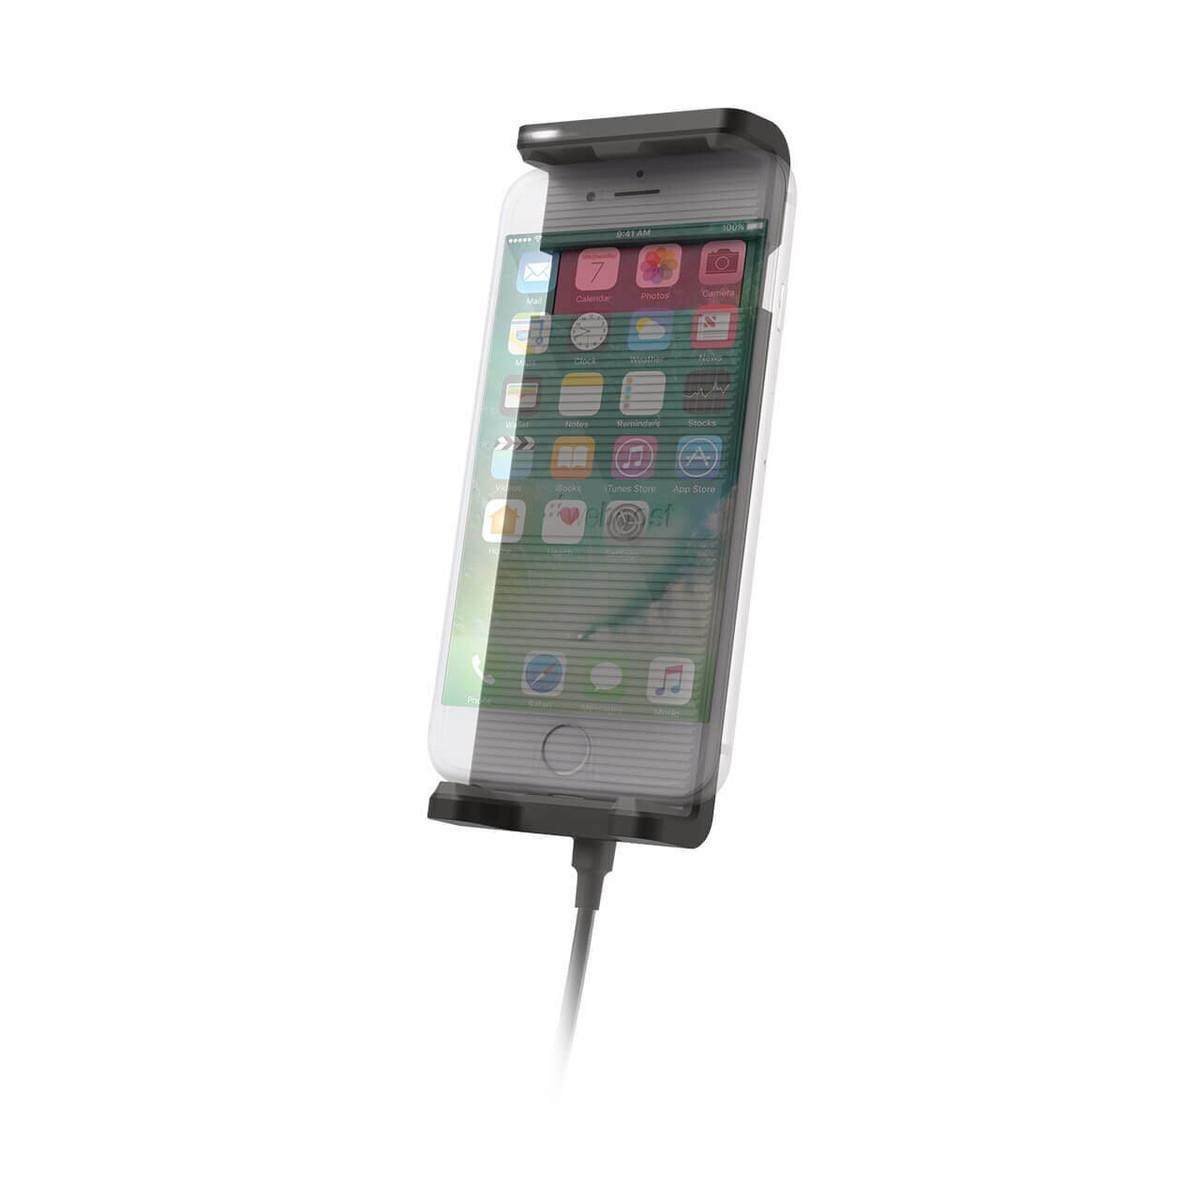 weBoost Drive Sleek 4G Cell Phone Booster Kit 470135 - Cradle